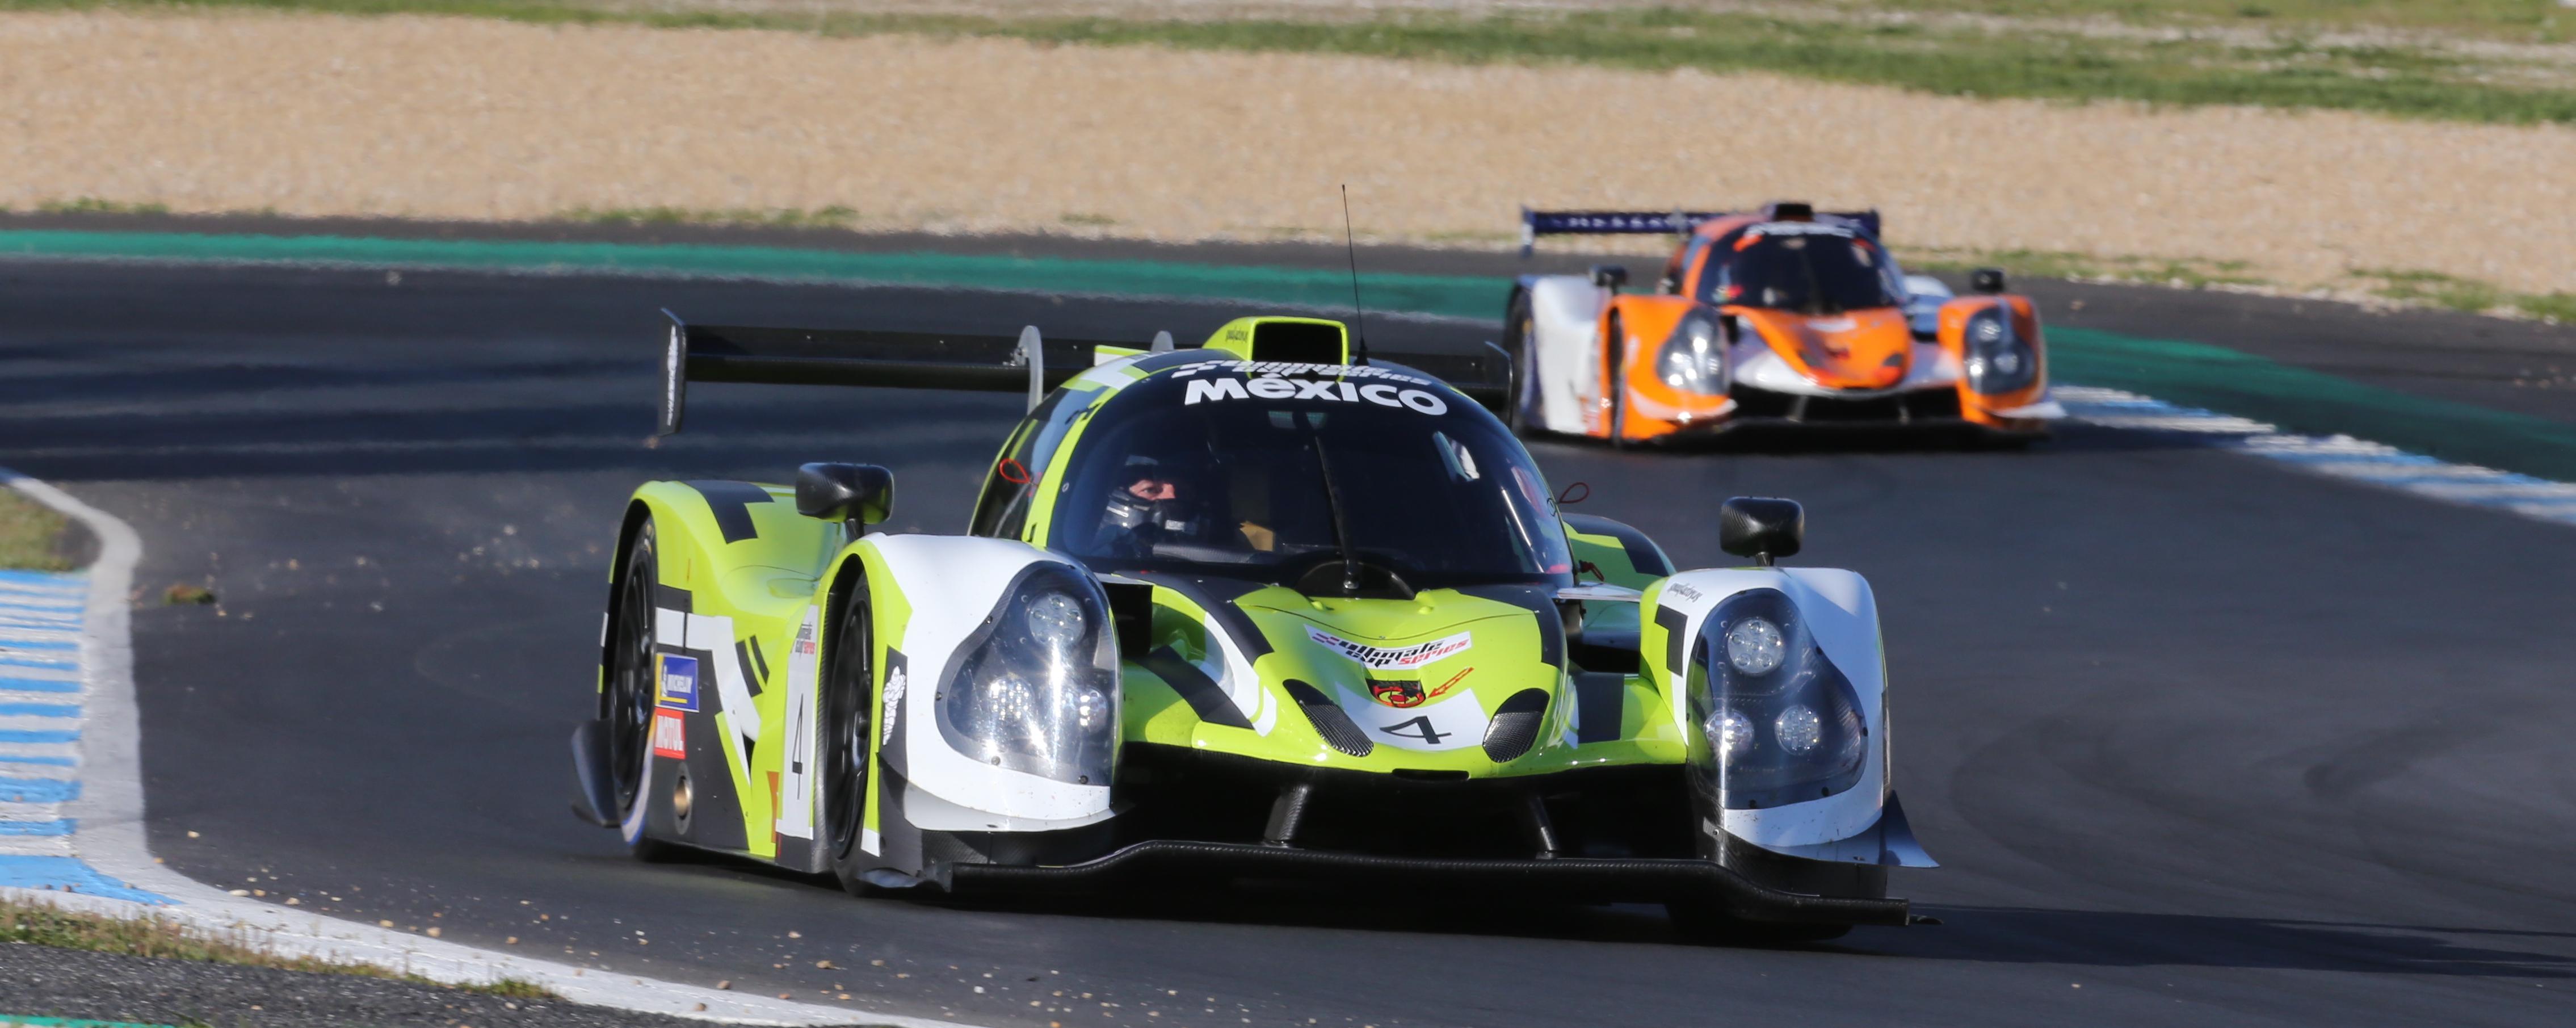 Speed_Factory_Ligier_JSP3_3